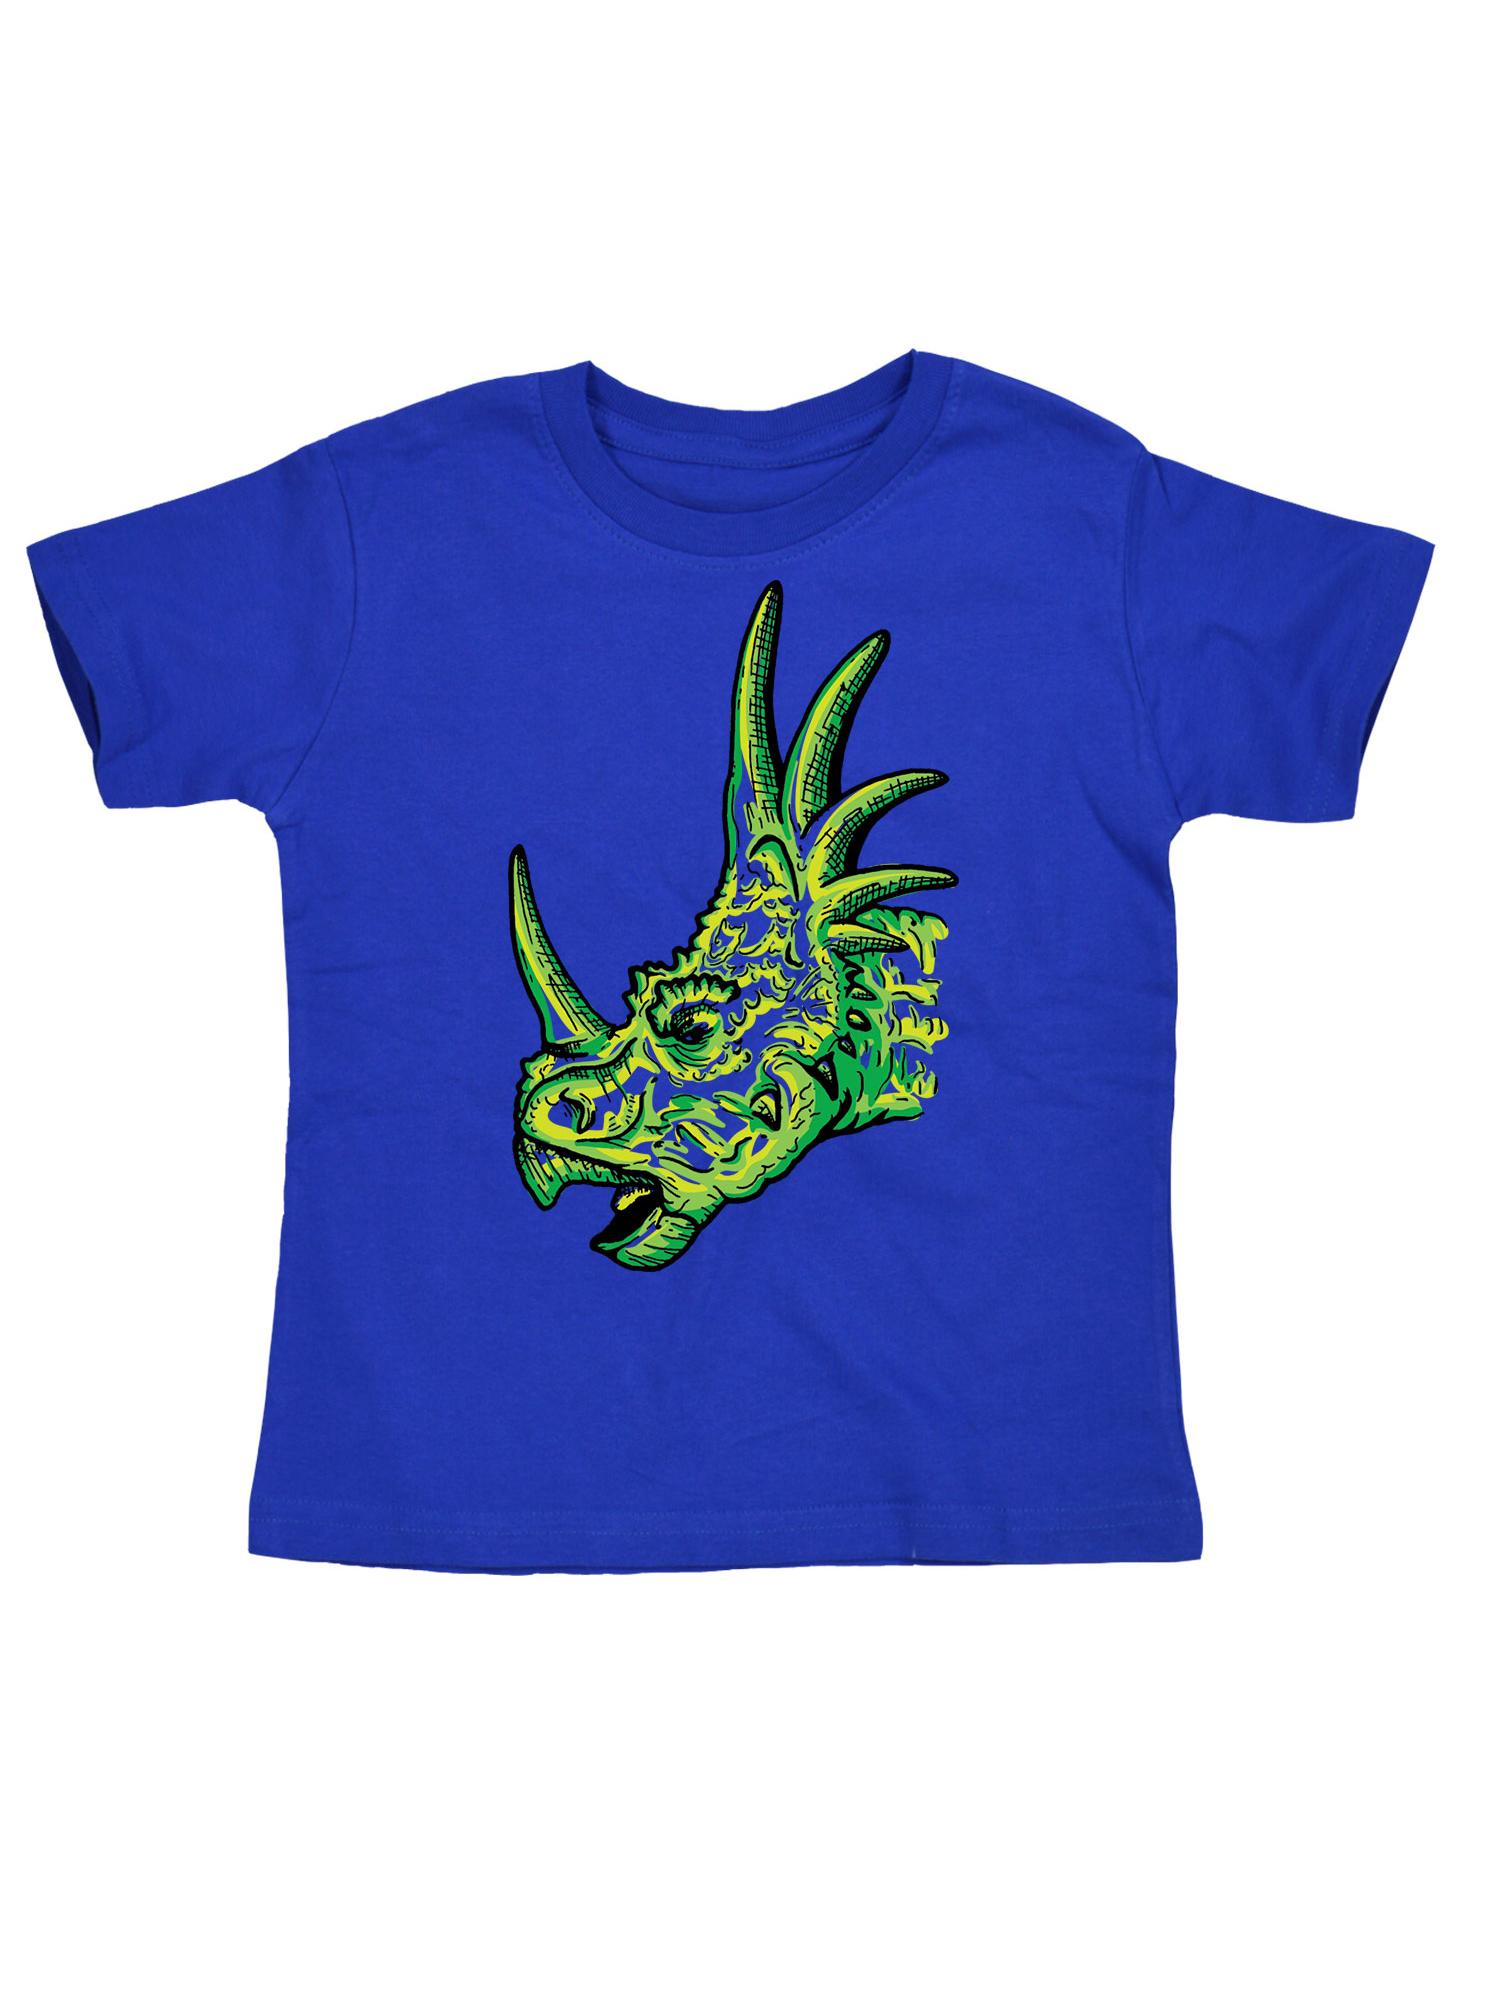 Sketched Styracosaurus Head Dino Dinosaur Horn Fashion Novelty Toddler T-Shirt